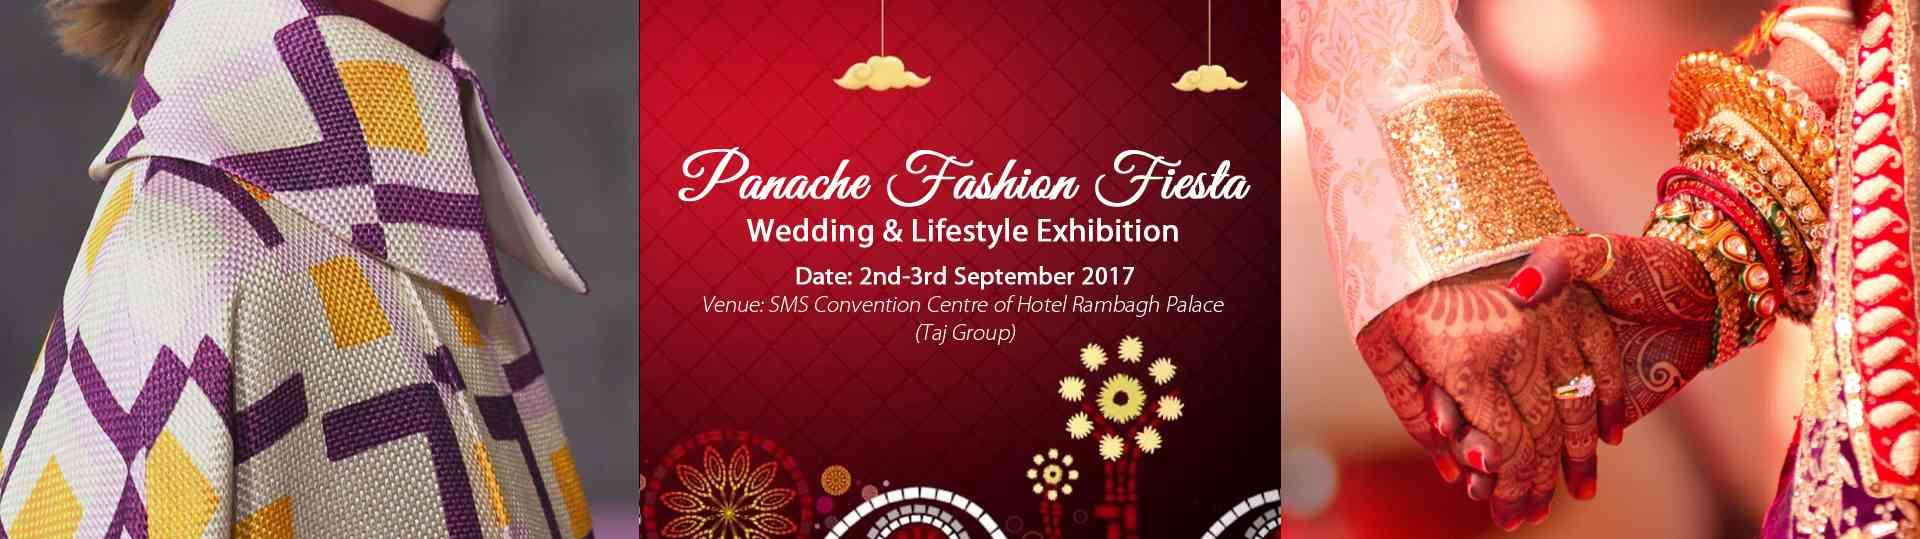 #panachefashionfiesta #panacheevents #weddingandlifestyleexhibition #hotelrambaghpalace